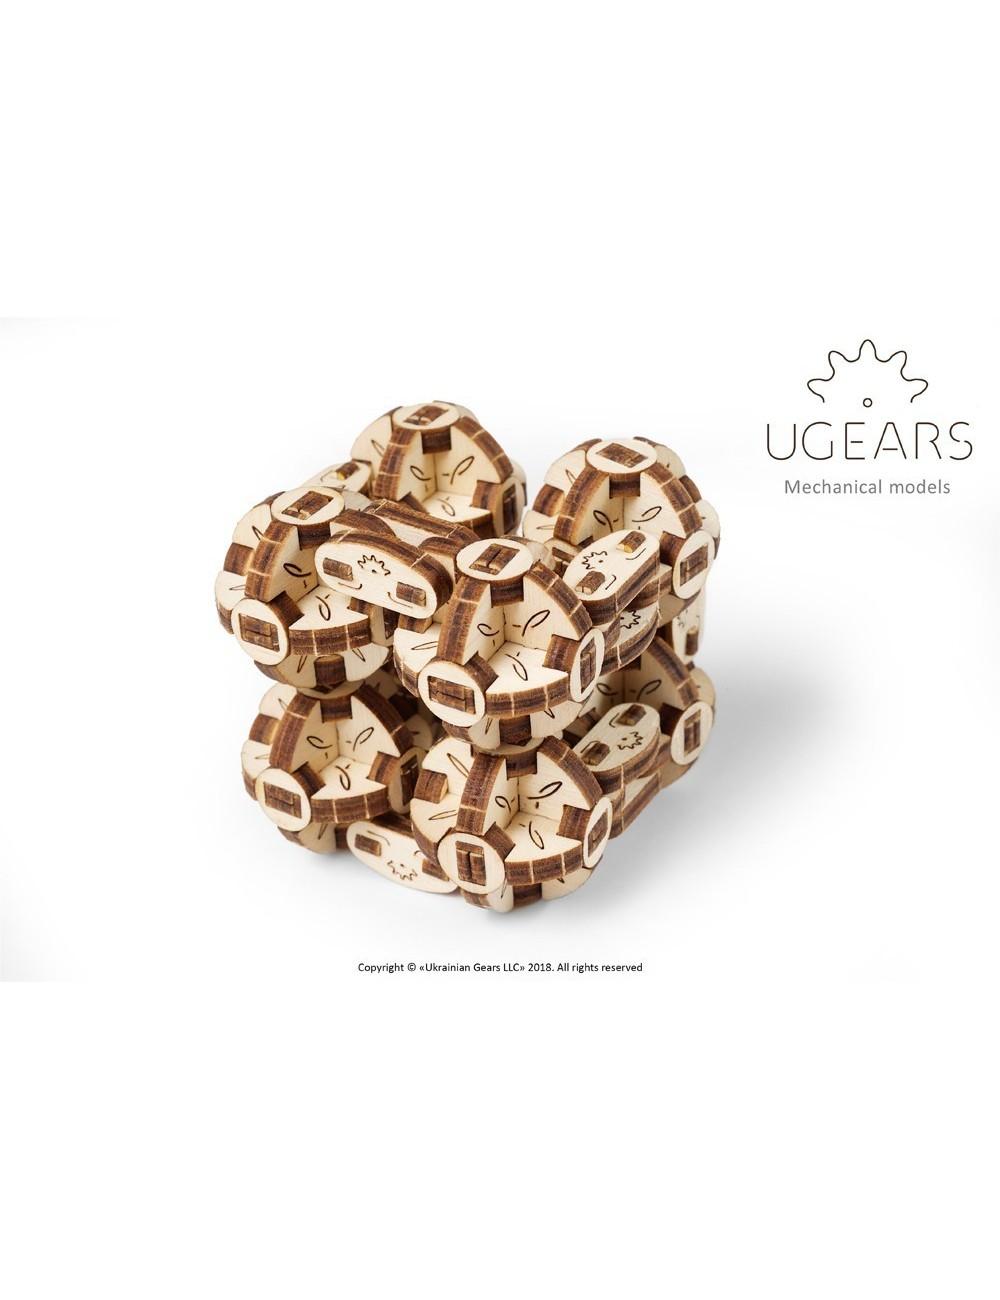 Cubo de esfera (Flexi-Cubus)